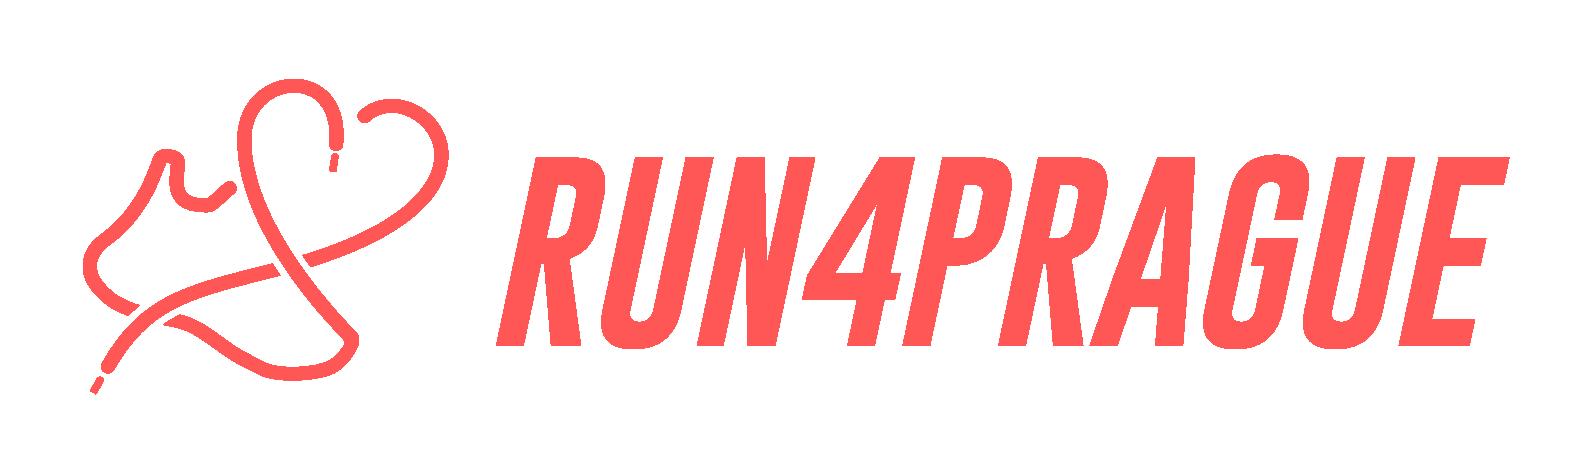 Run 4 Prague